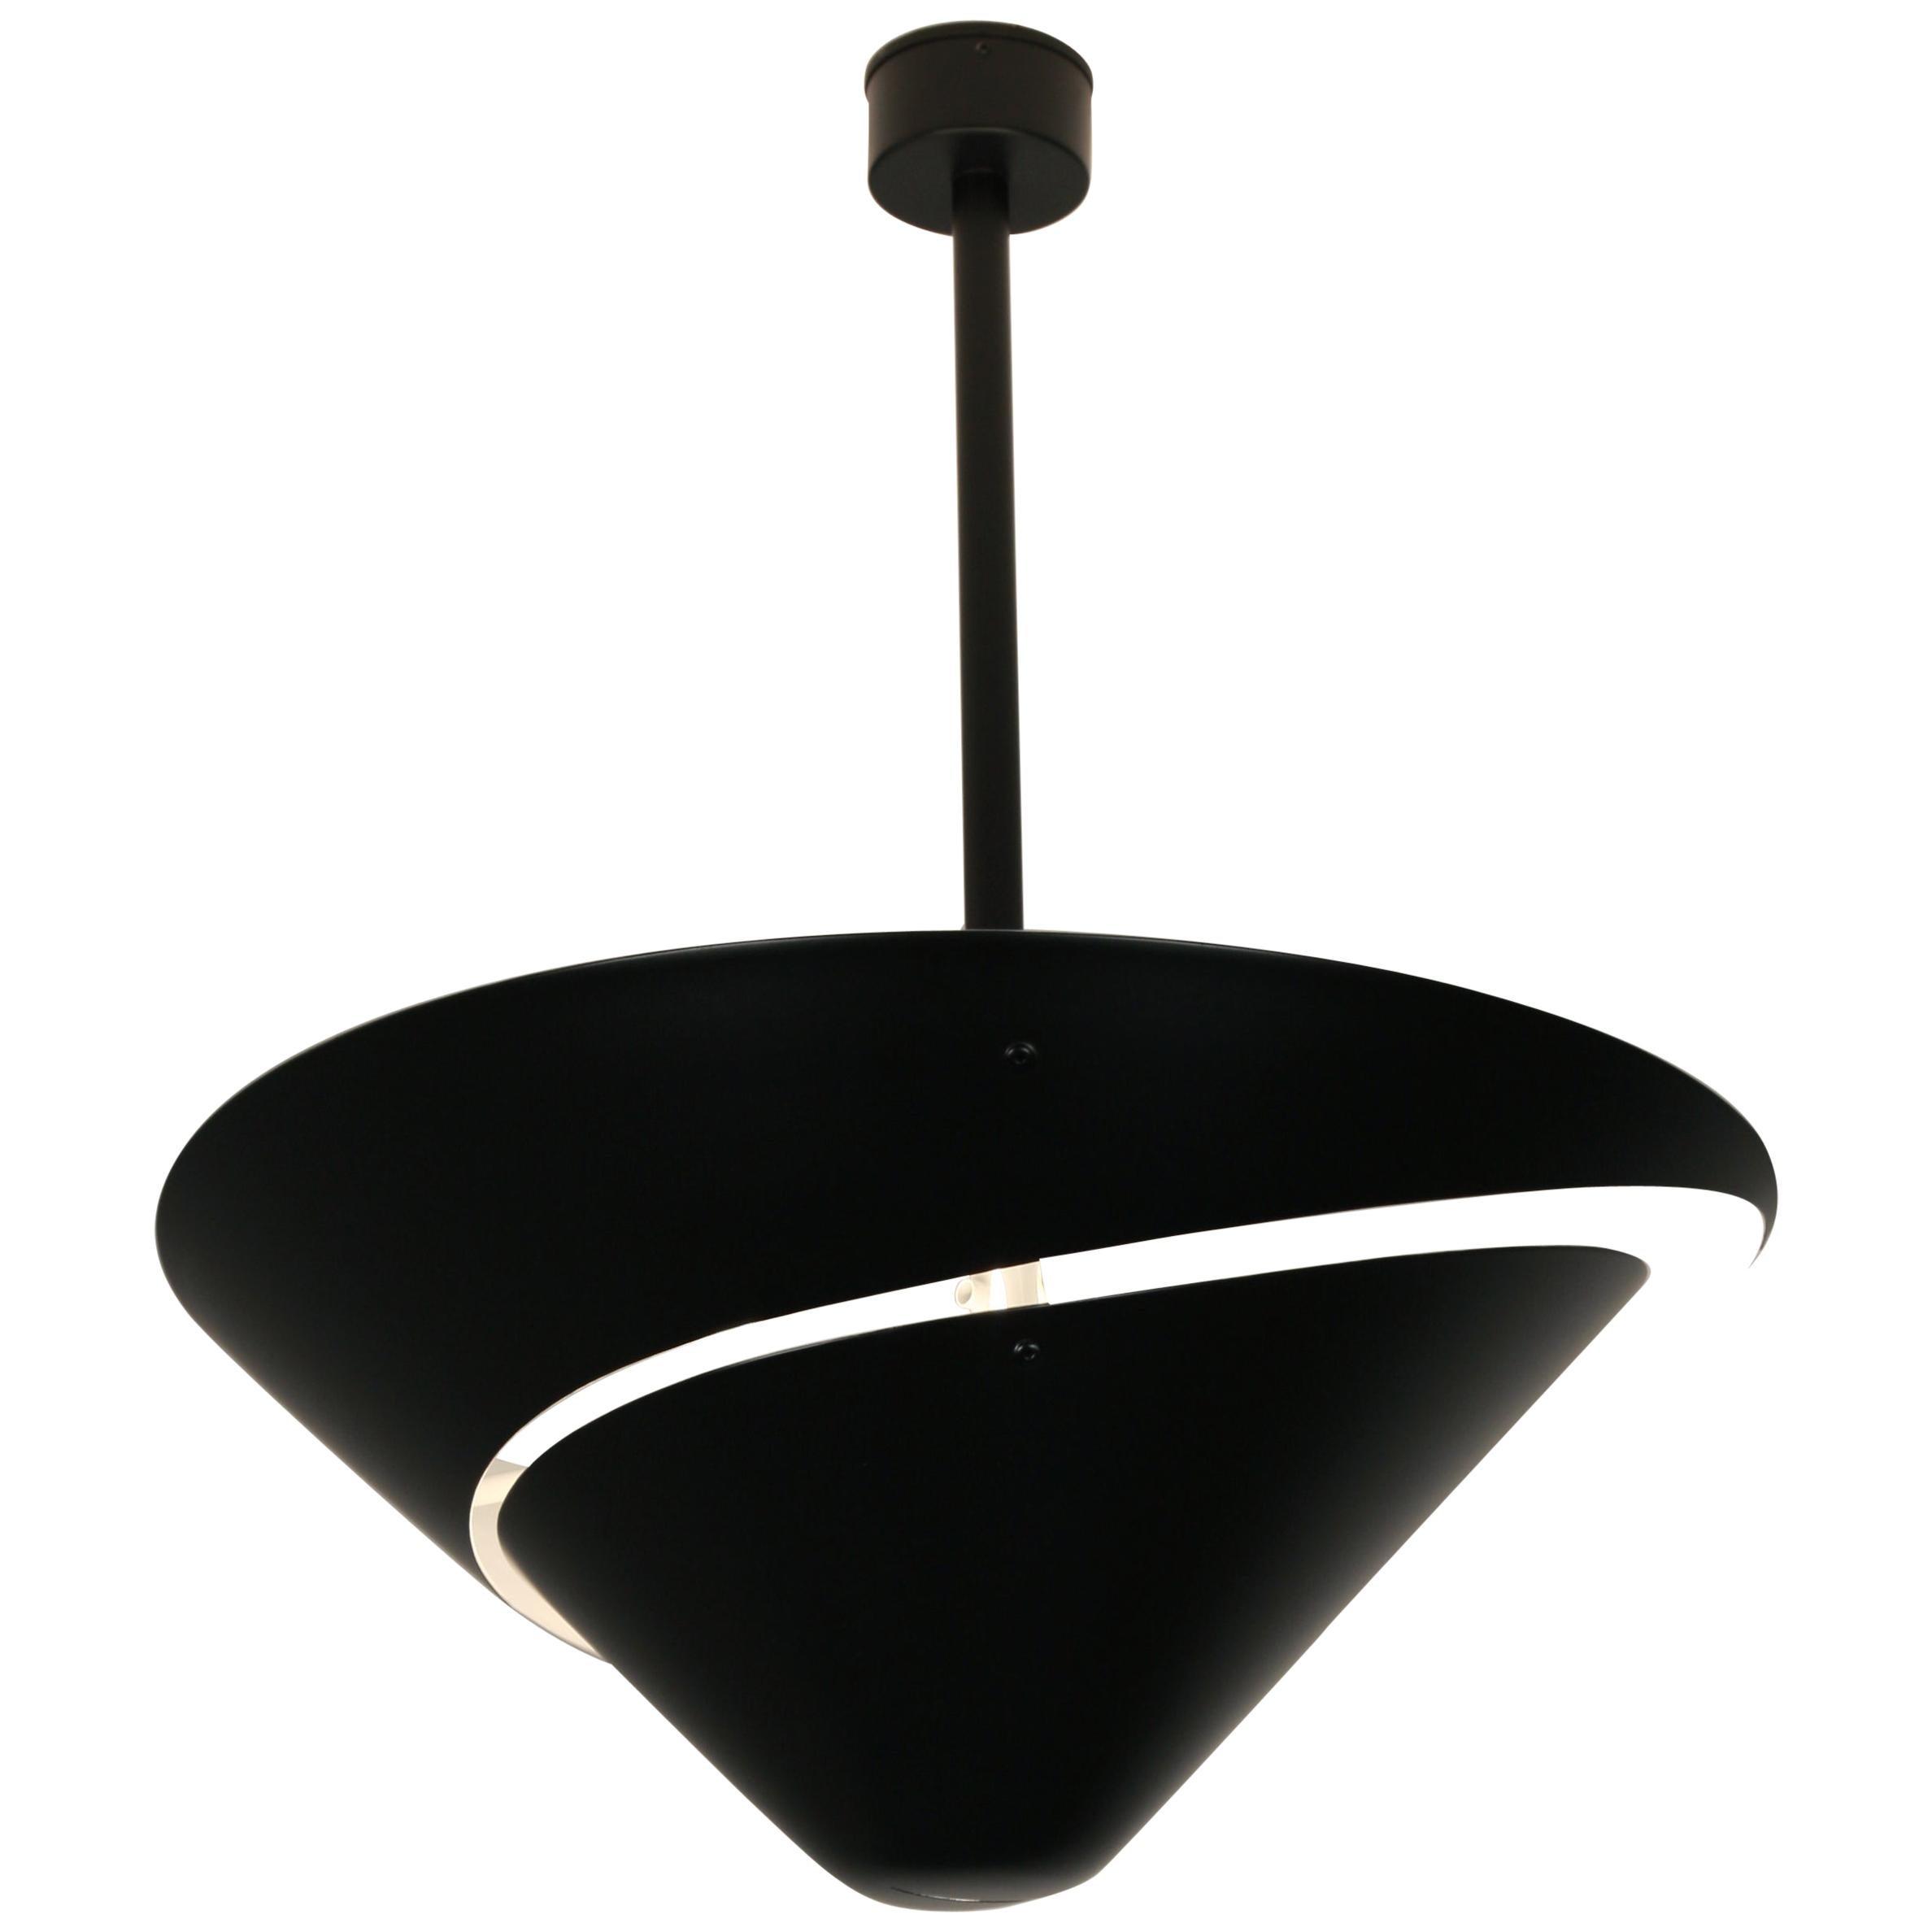 Serge Mouille 'Snail' Ceiling Lamp